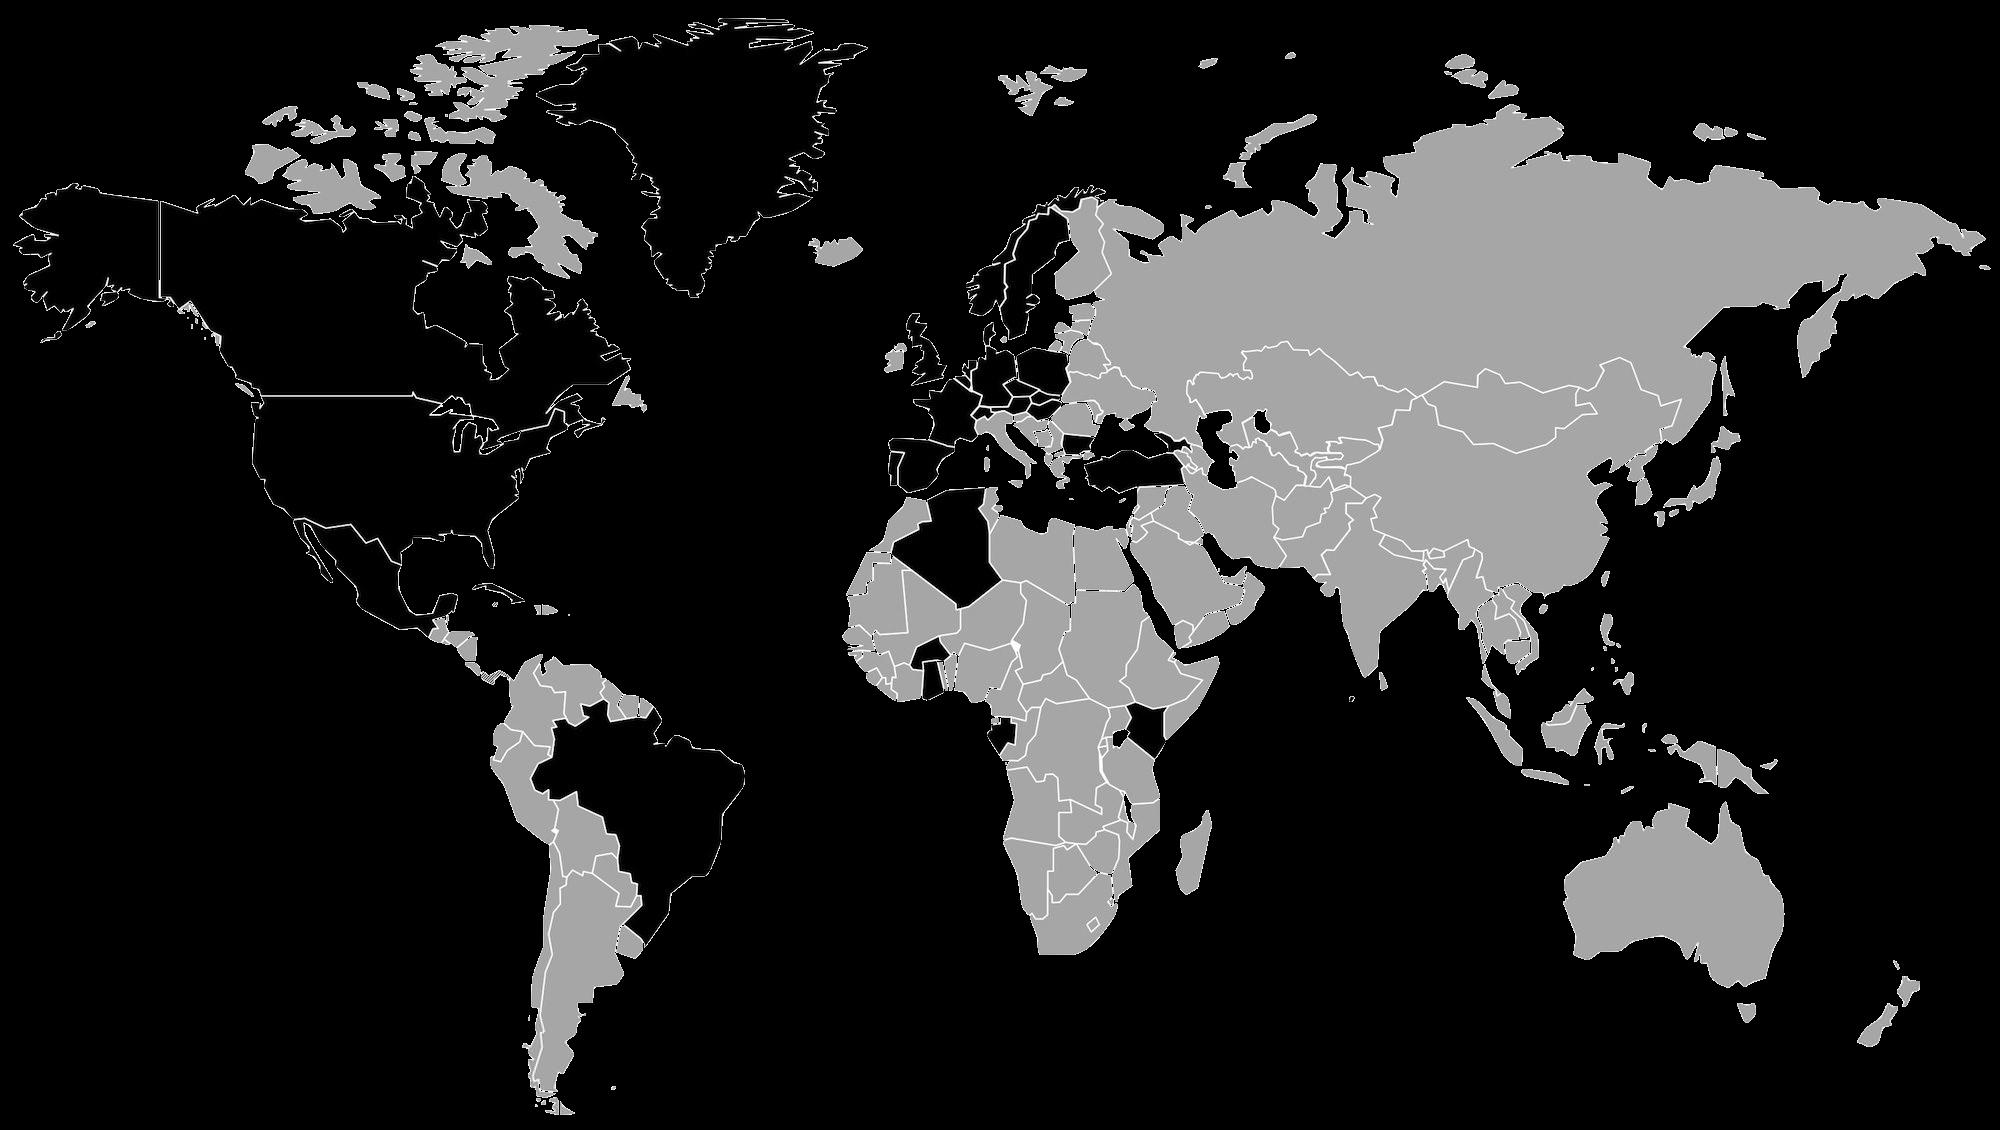 Levoxx_global_experience_2